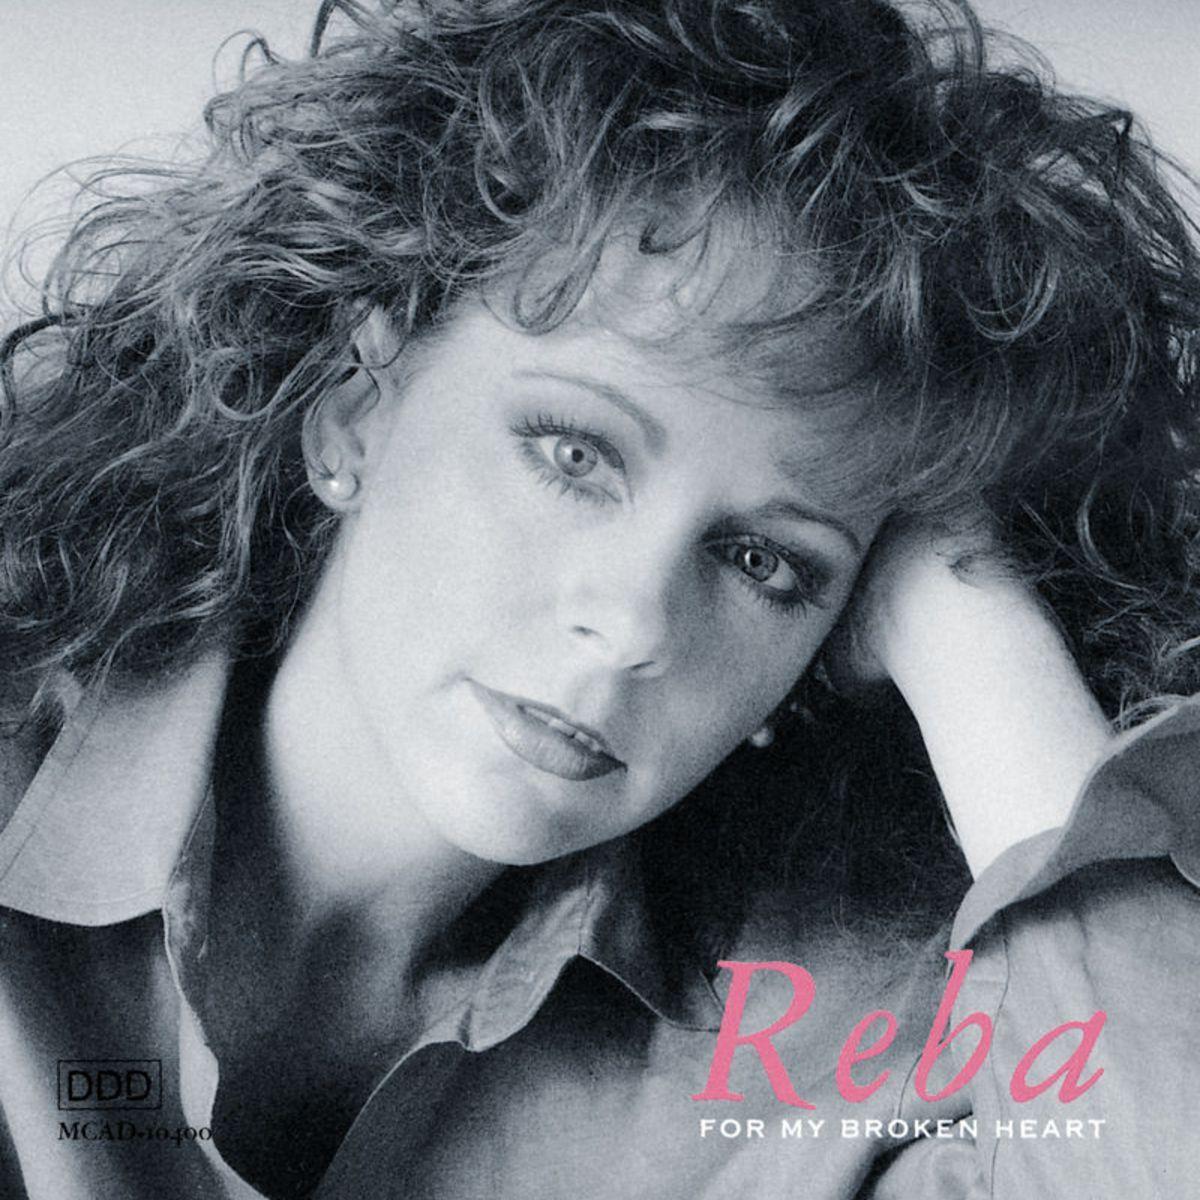 Reba McEntire - For My Broken Heart Album Cover